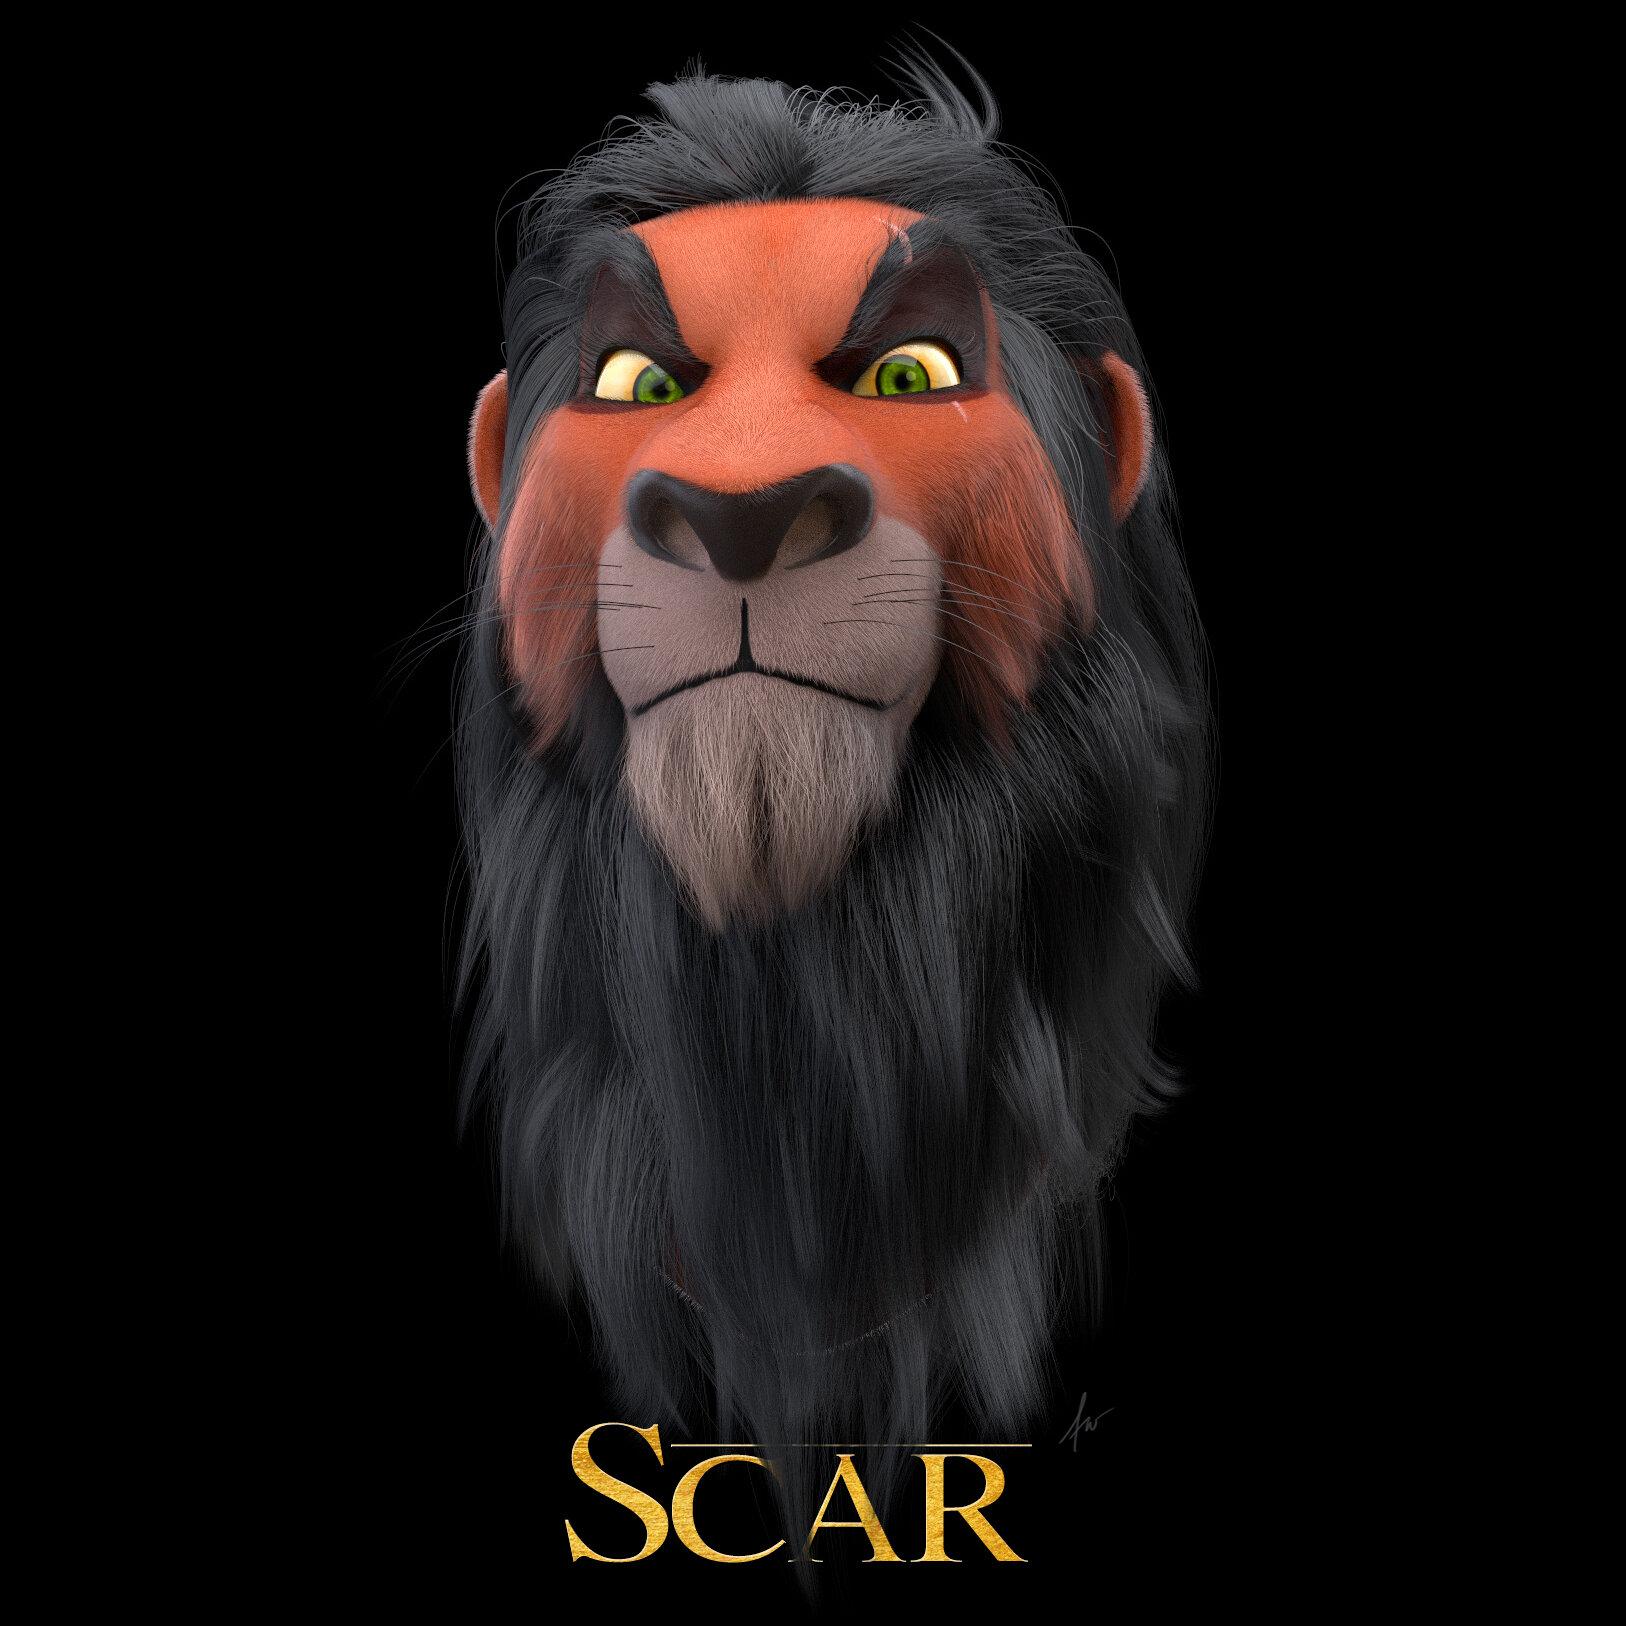 scarFinal01.jpg